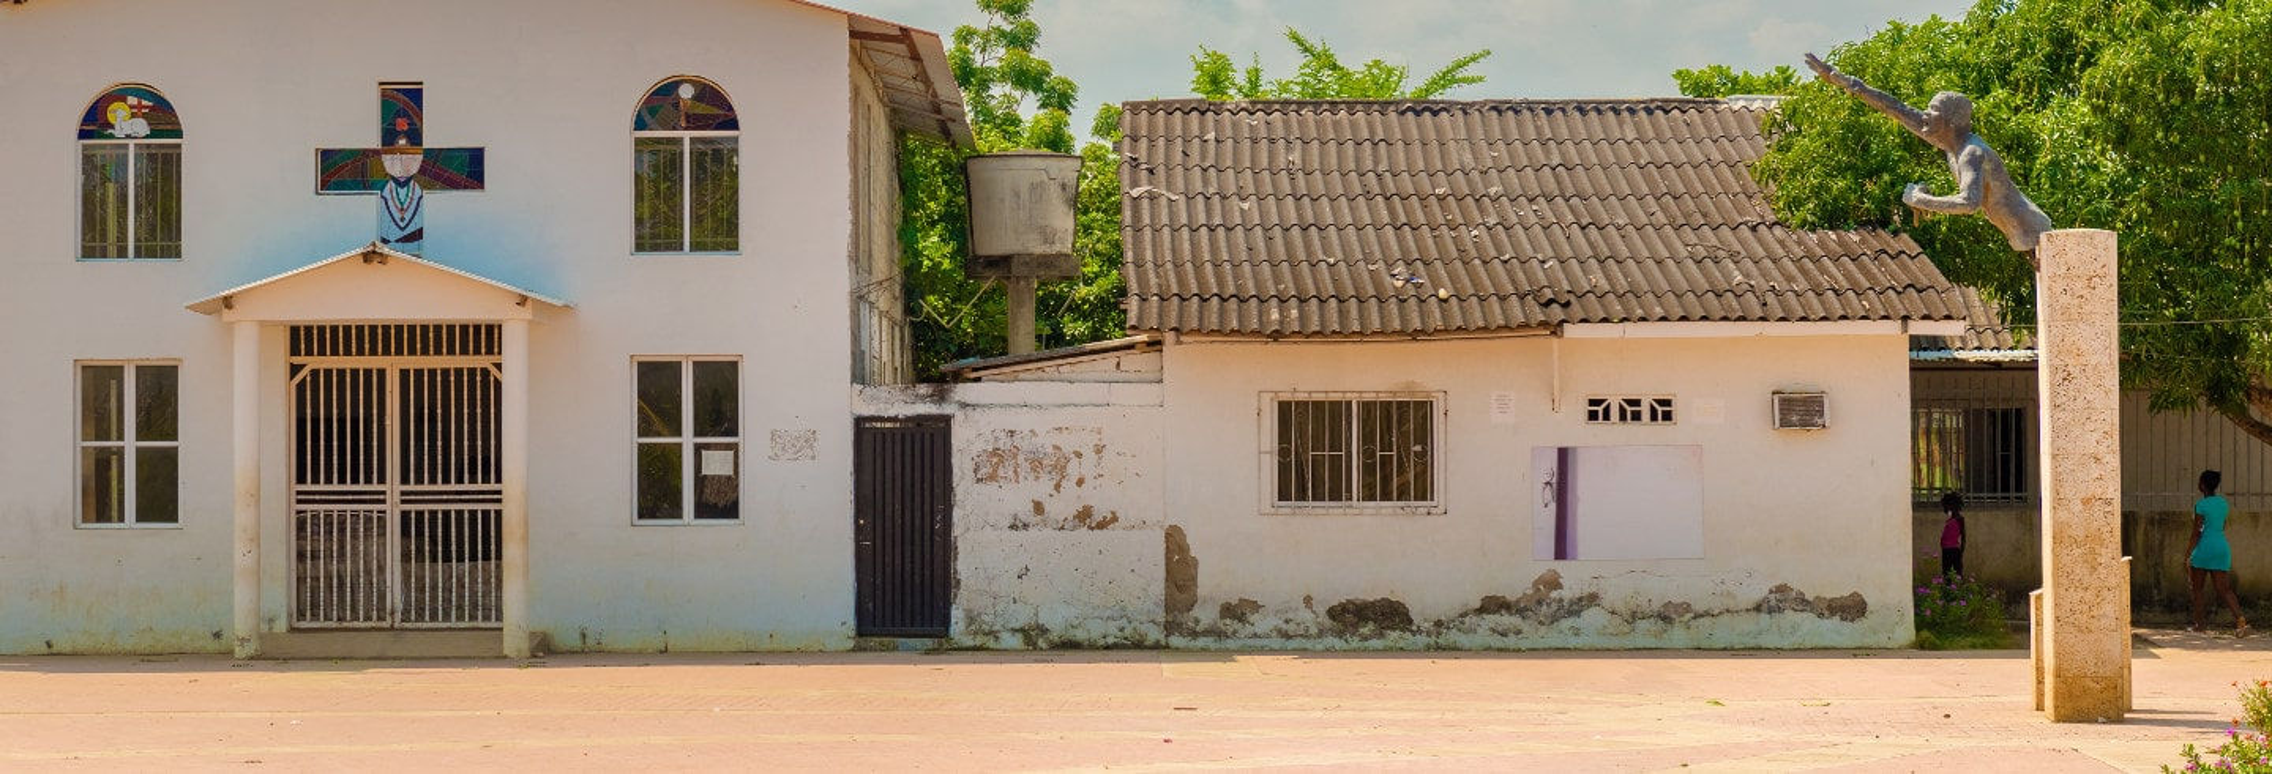 Excursión a San Basilio de Palenque